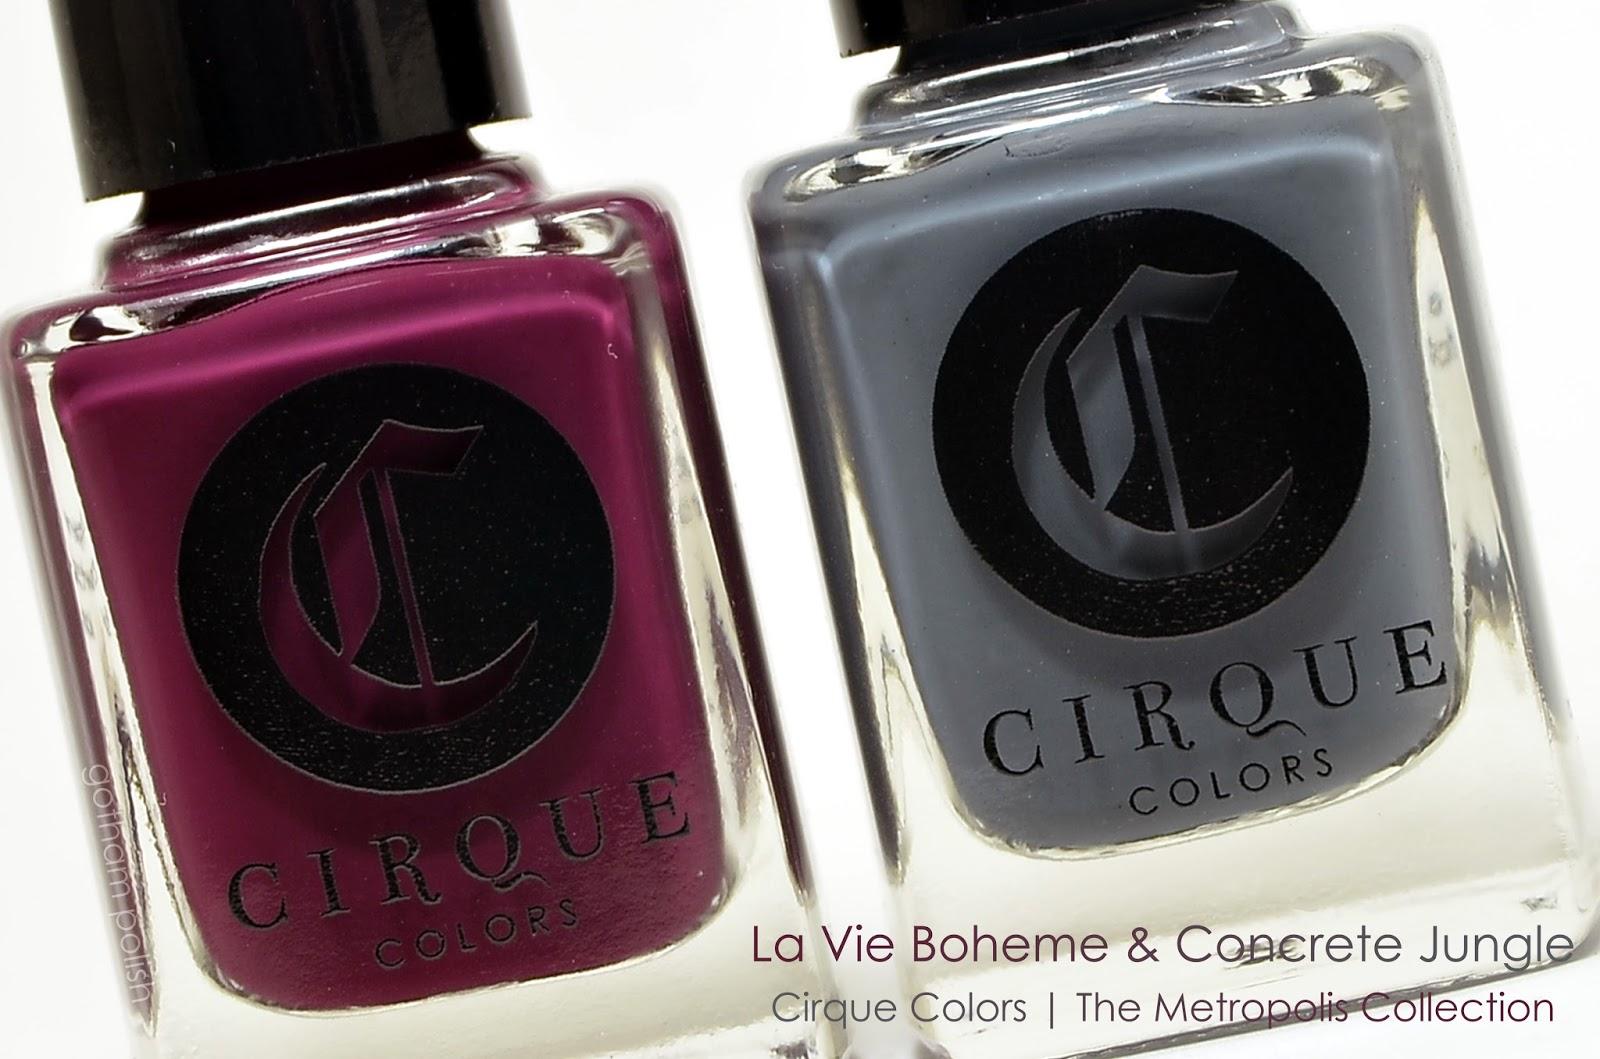 Cirque Colors La Vie Boheme and Concrete Jungle